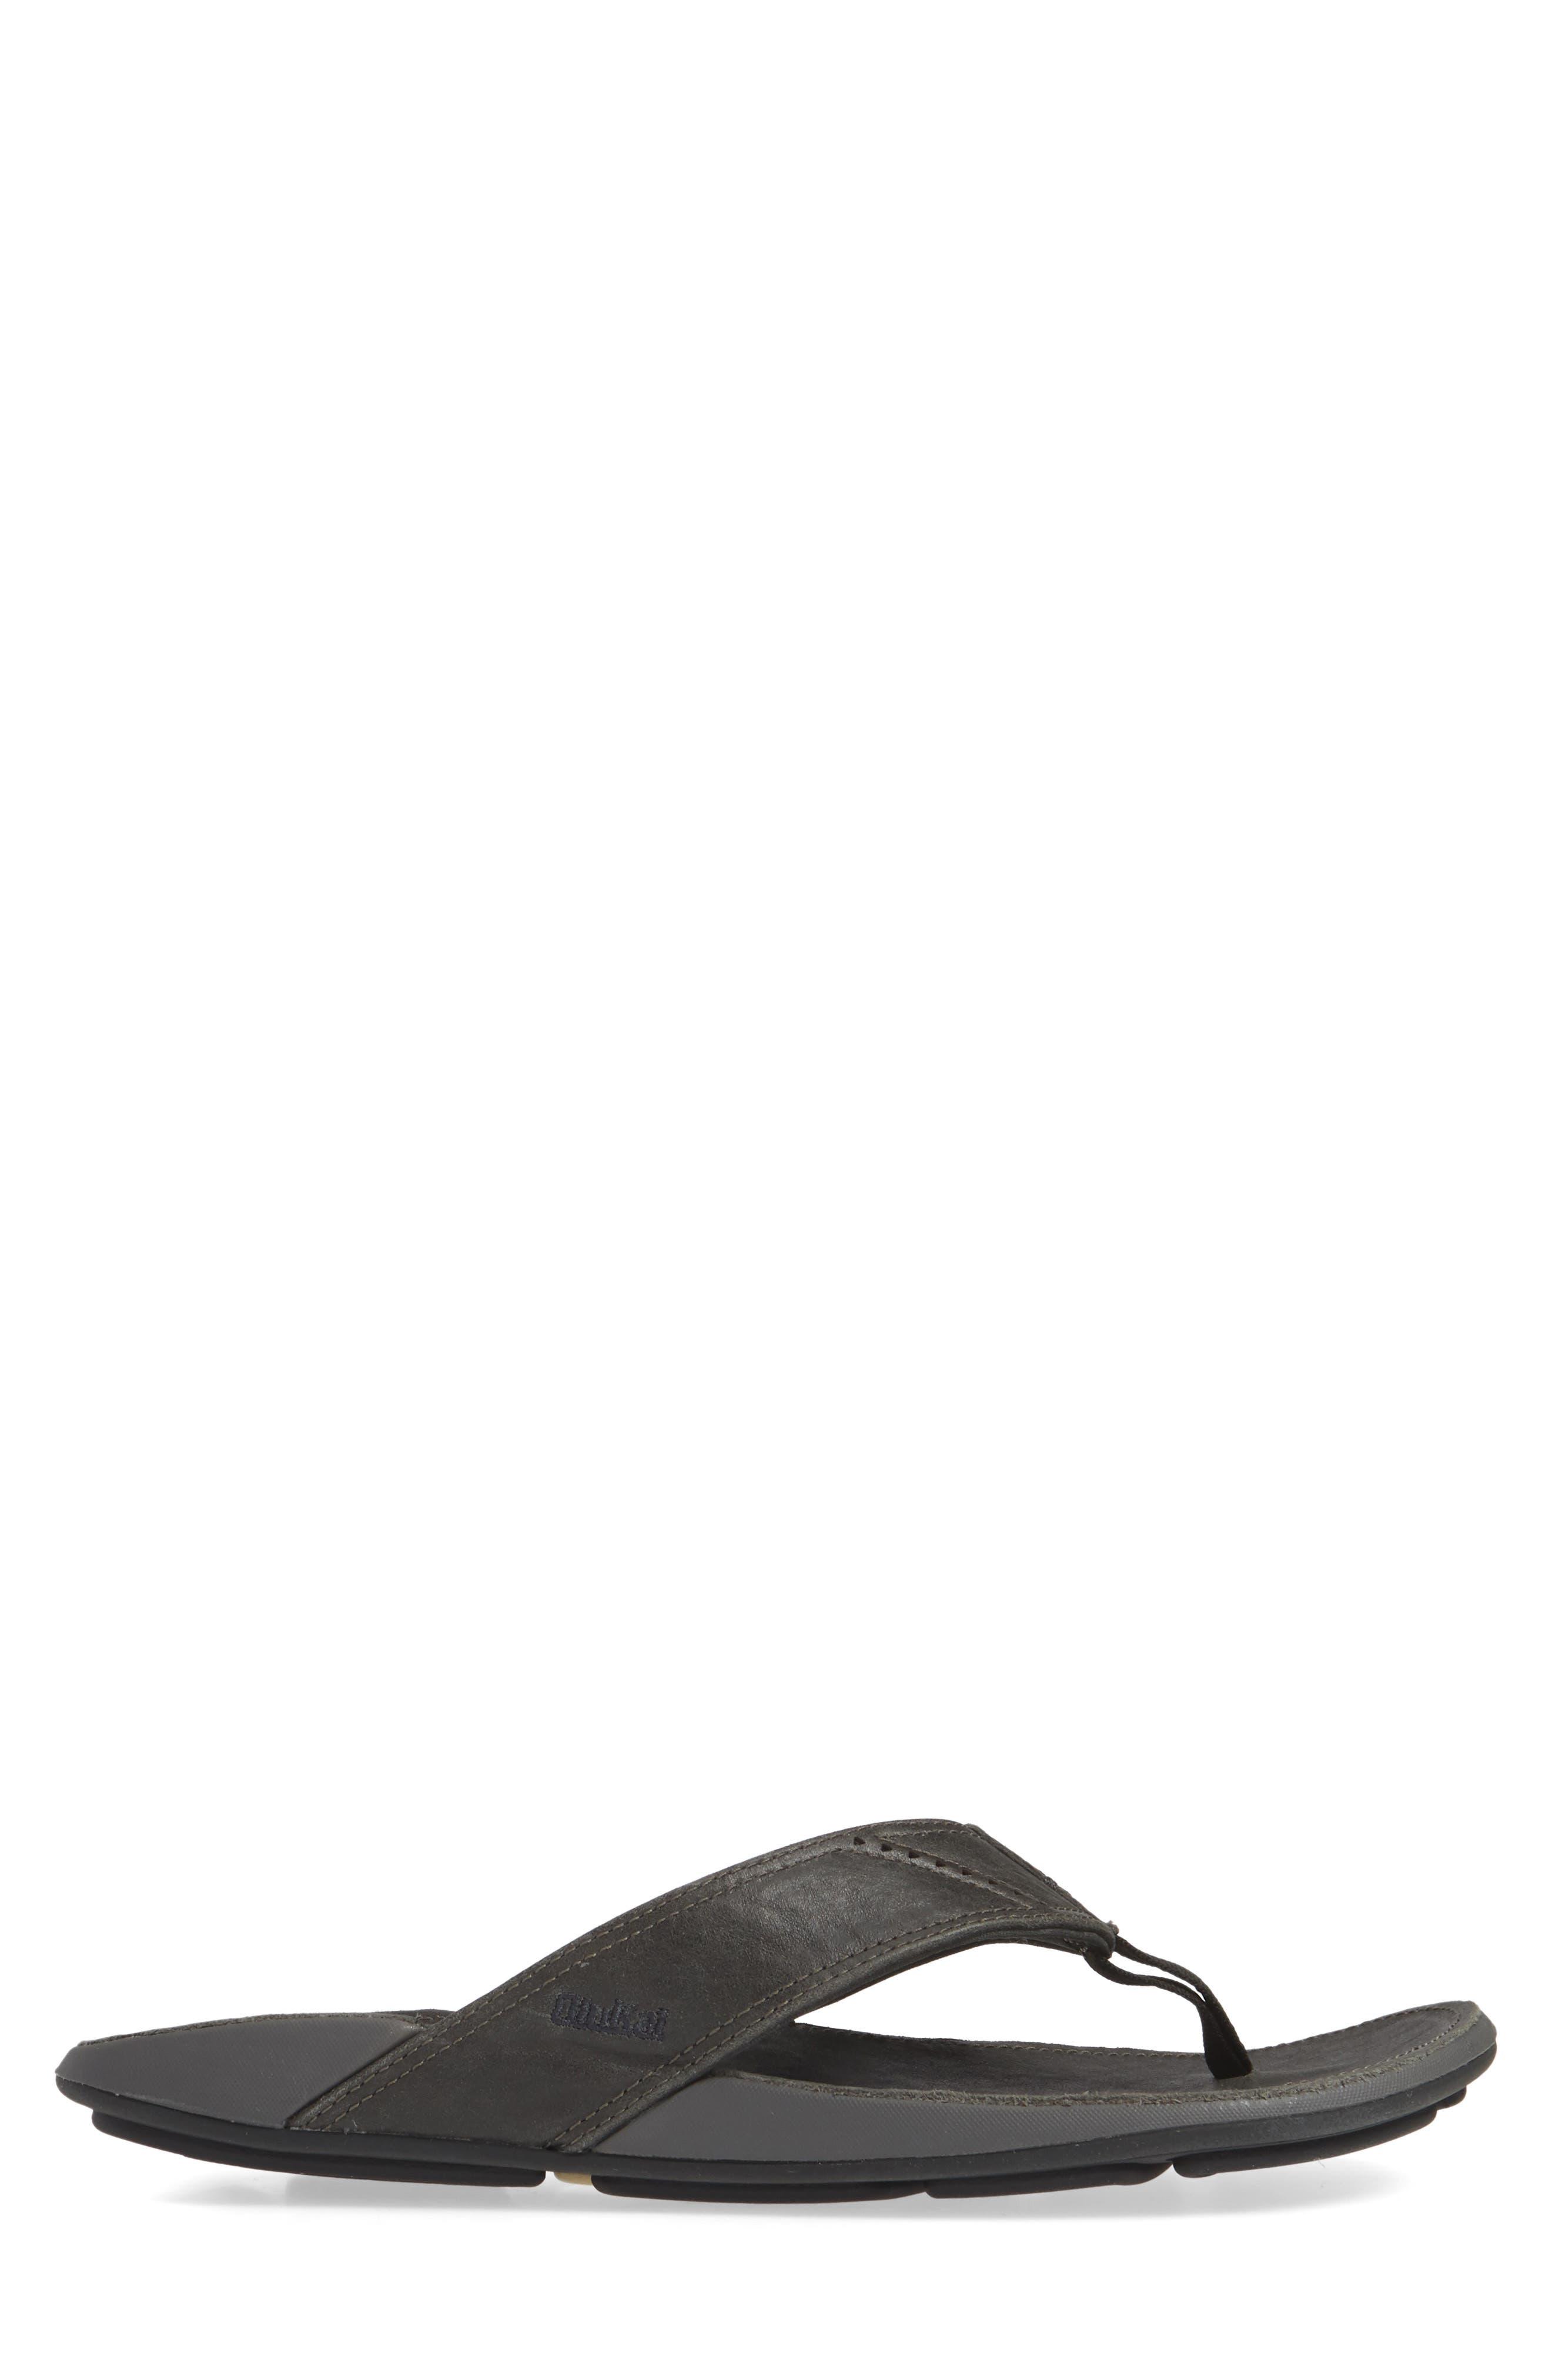 OLUKAI, 'Nui' Leather Flip Flop, Alternate thumbnail 3, color, LAVA ROCK LEATHER